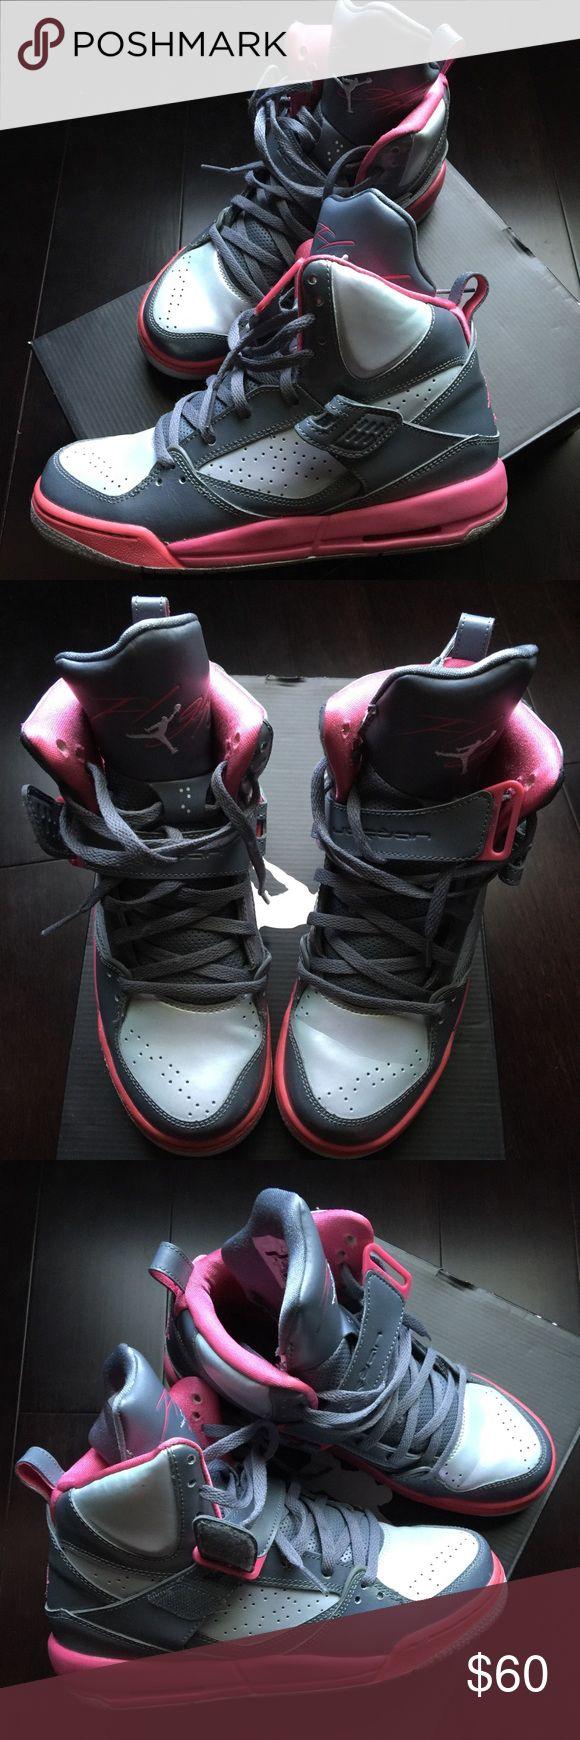 414b4d90225 17 best ideas about Pink Basketball Shoes on Pinterest